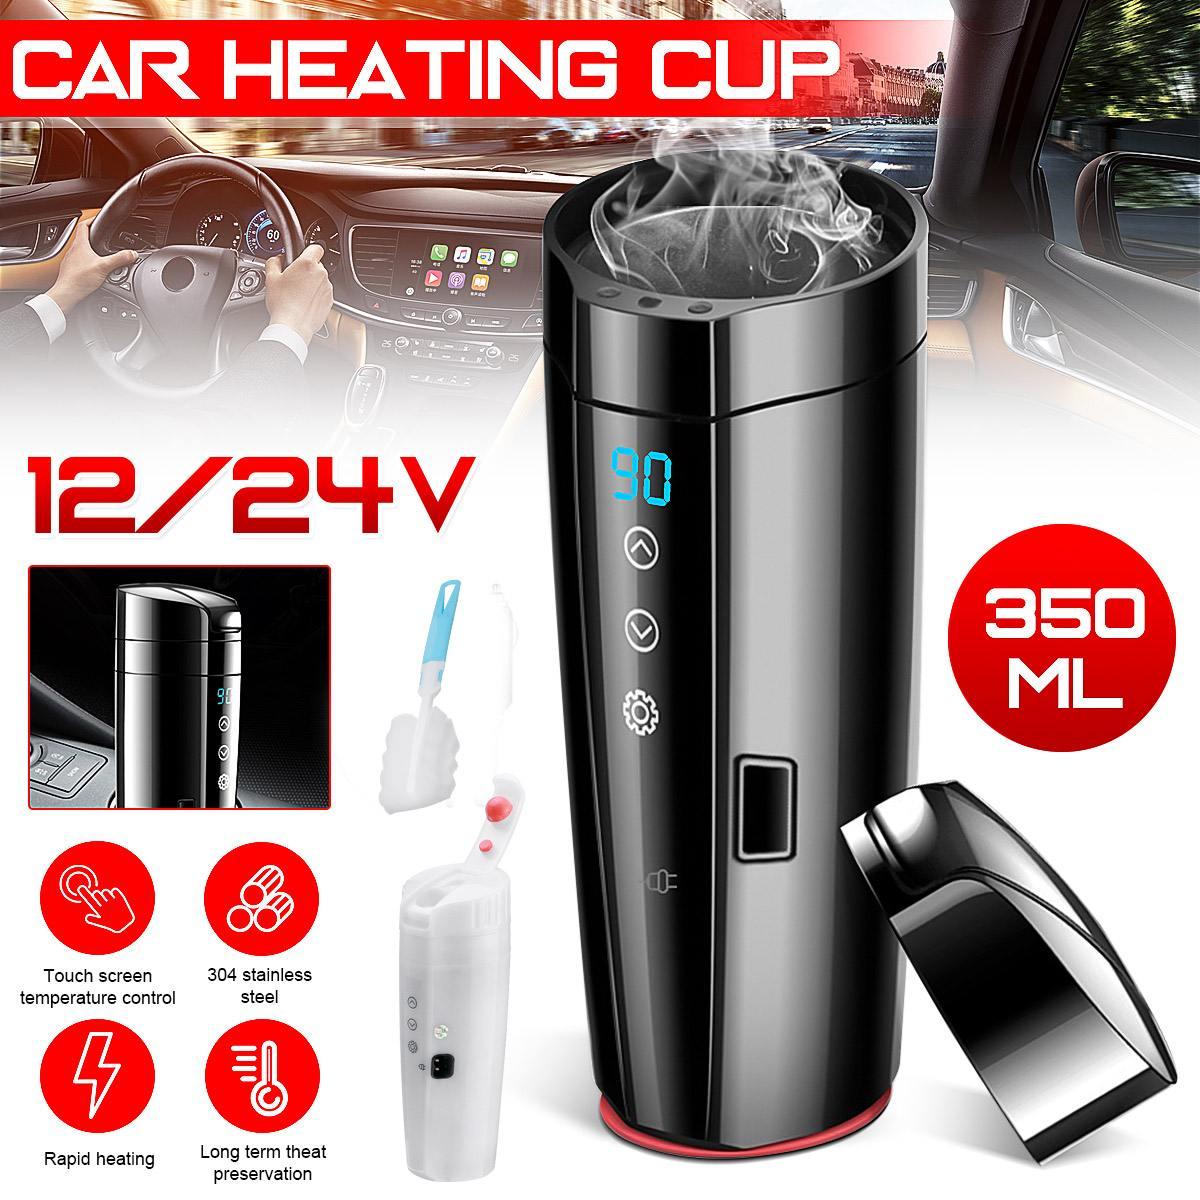 KROAK 450ml Stainless Steel Car Heating Cup 12V/24V Electric Water Cup LCD Display Temperature Kettle Coffee Tea Milk Heated